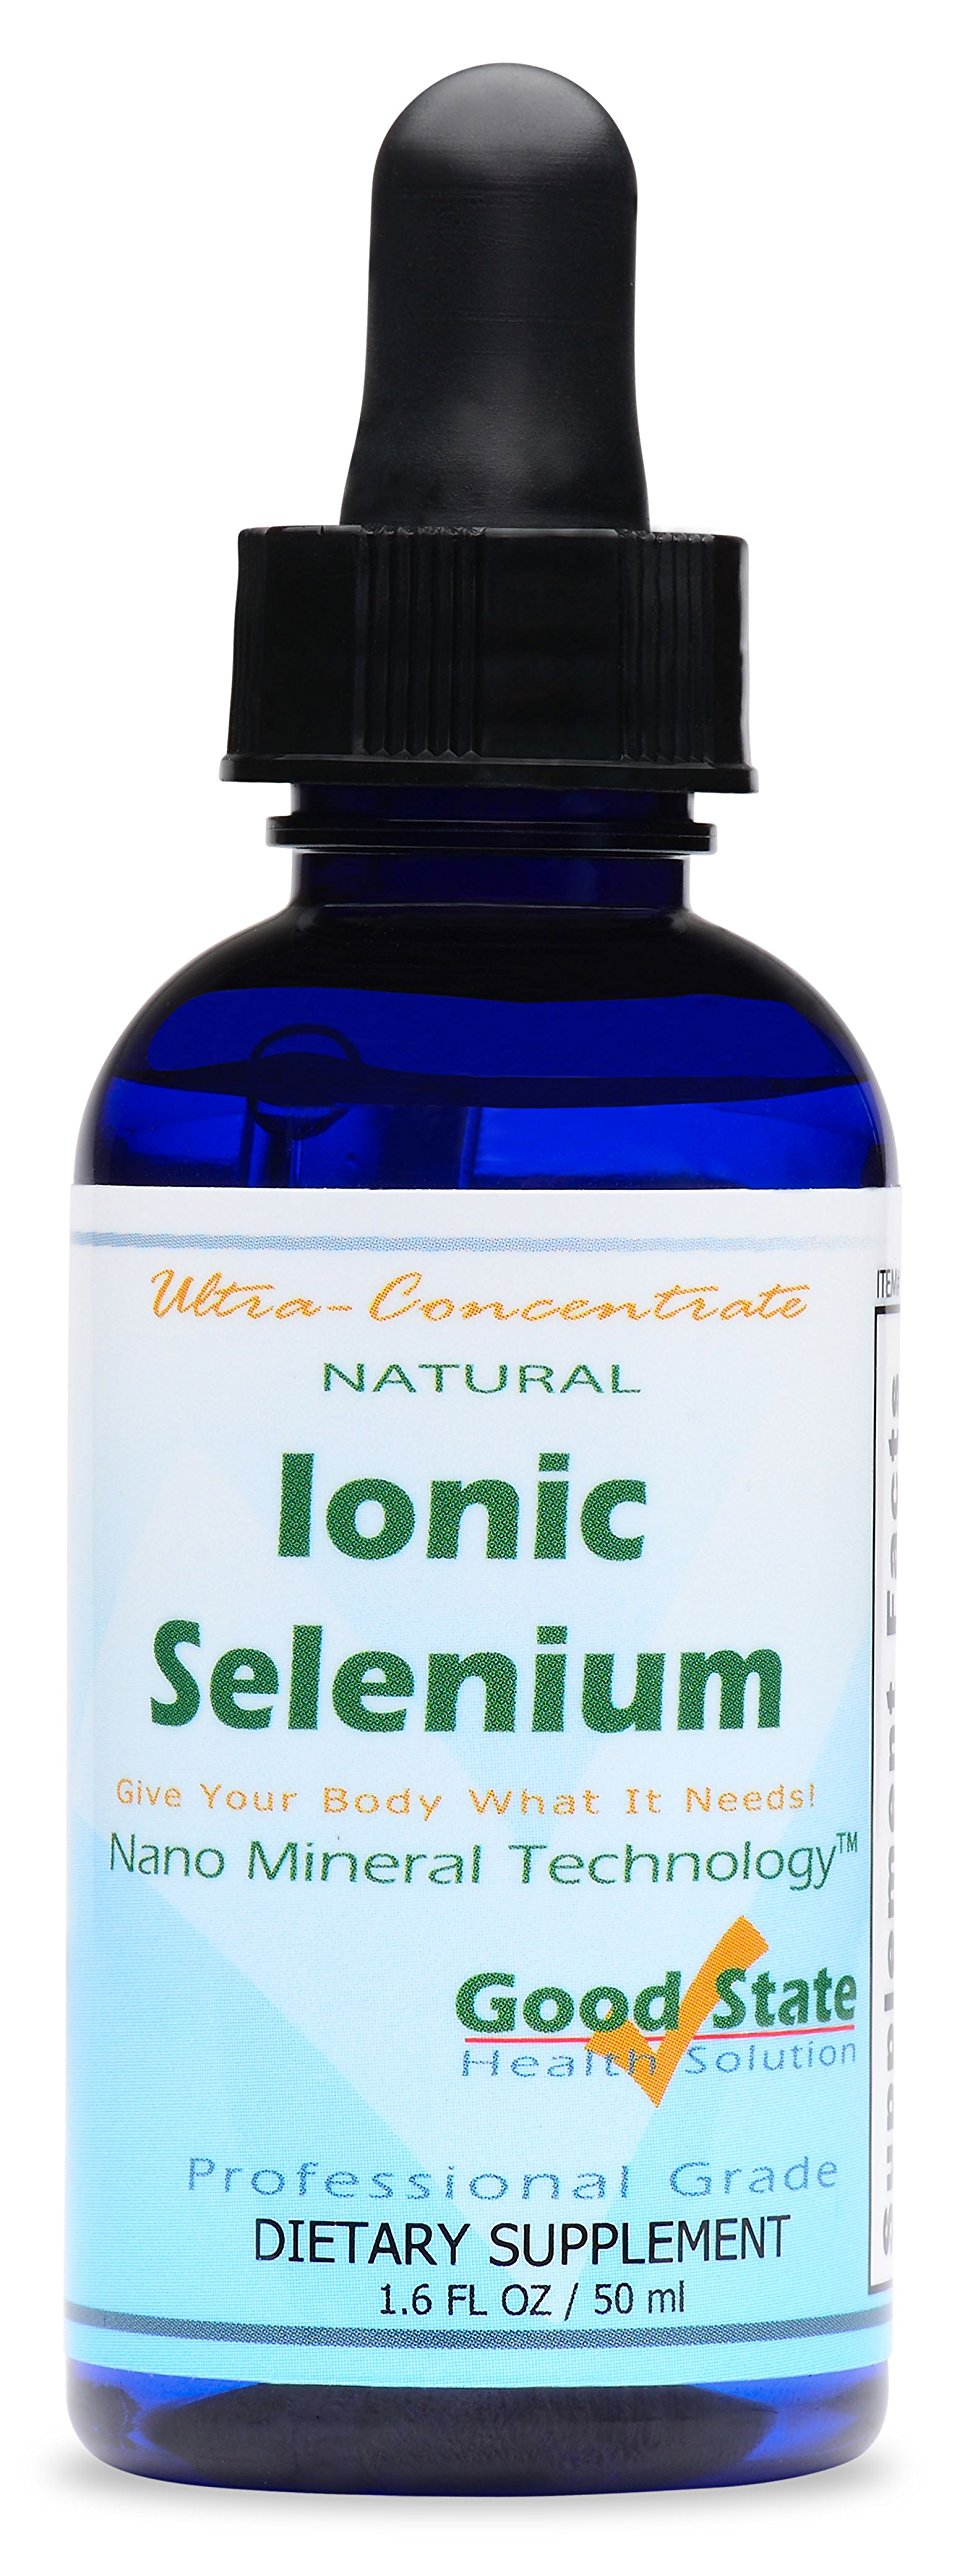 Good State Liquid Ionic Minerals - Selenium Ultra Concentrate - (10 drops equals 70 mcg) (100 servings per bottle)